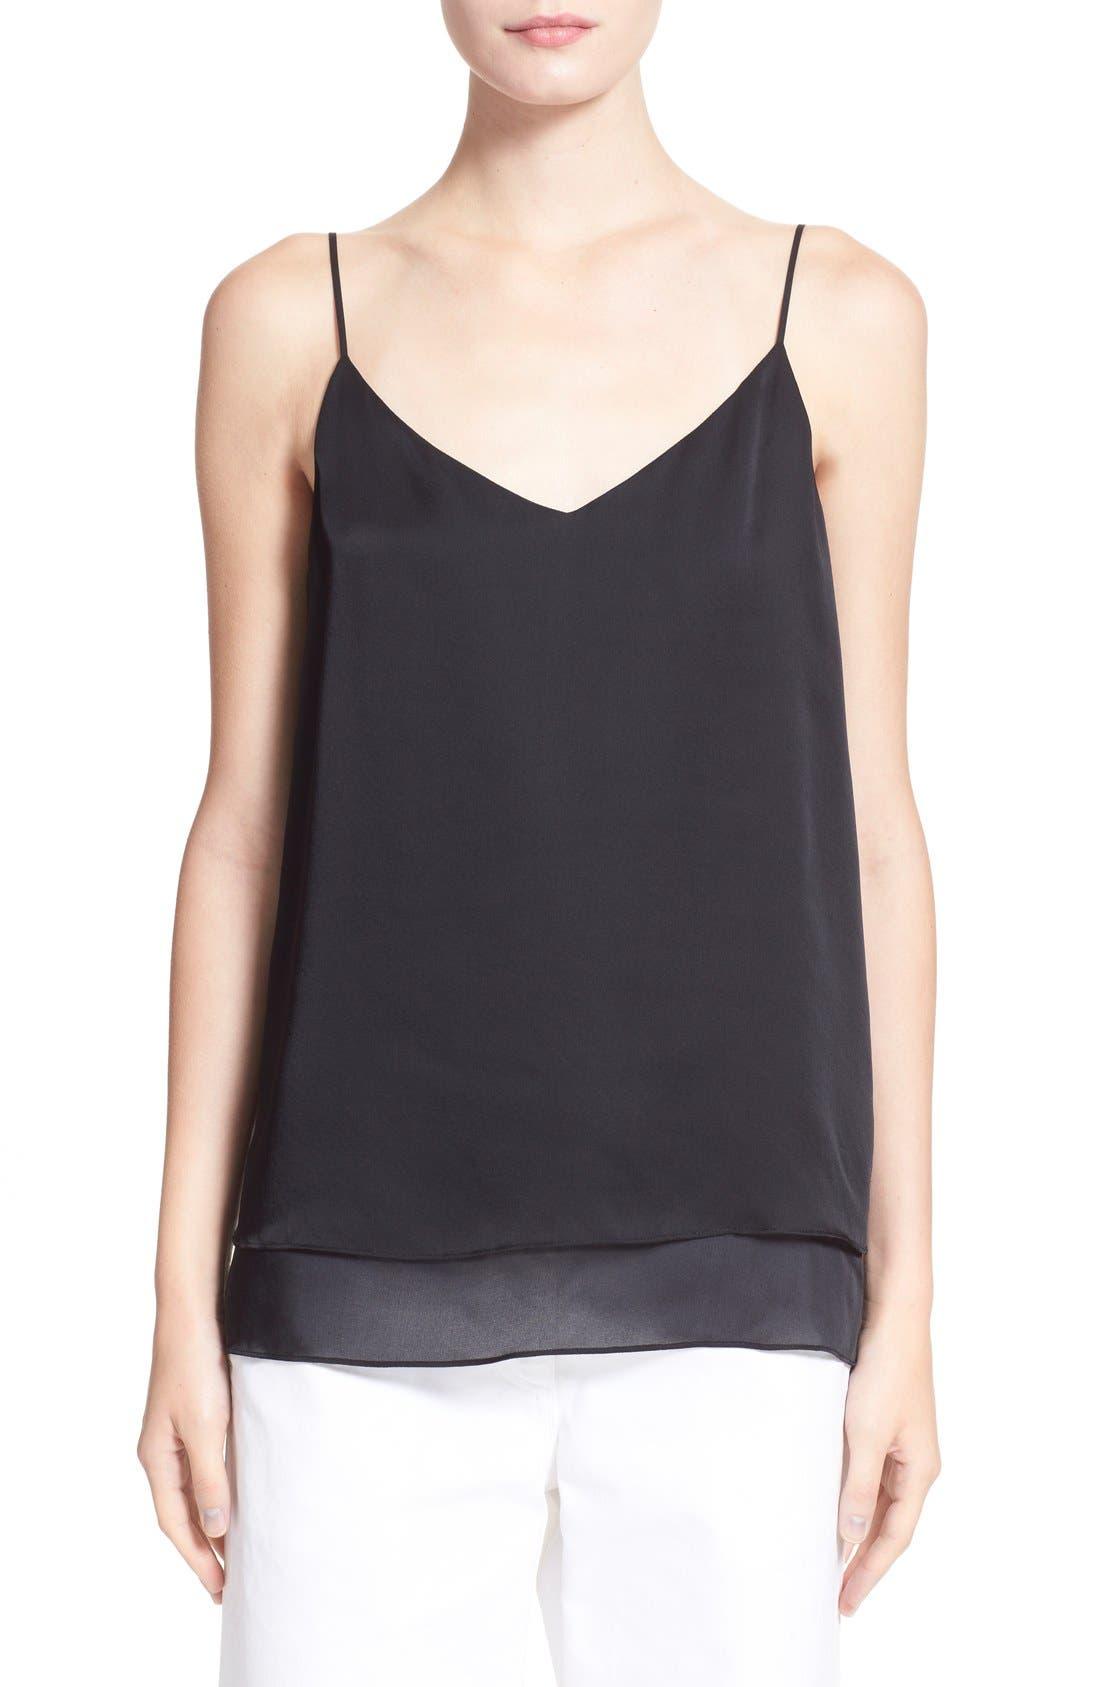 Alternate Image 1 Selected - rag & bone 'Lora' Silk Camisole